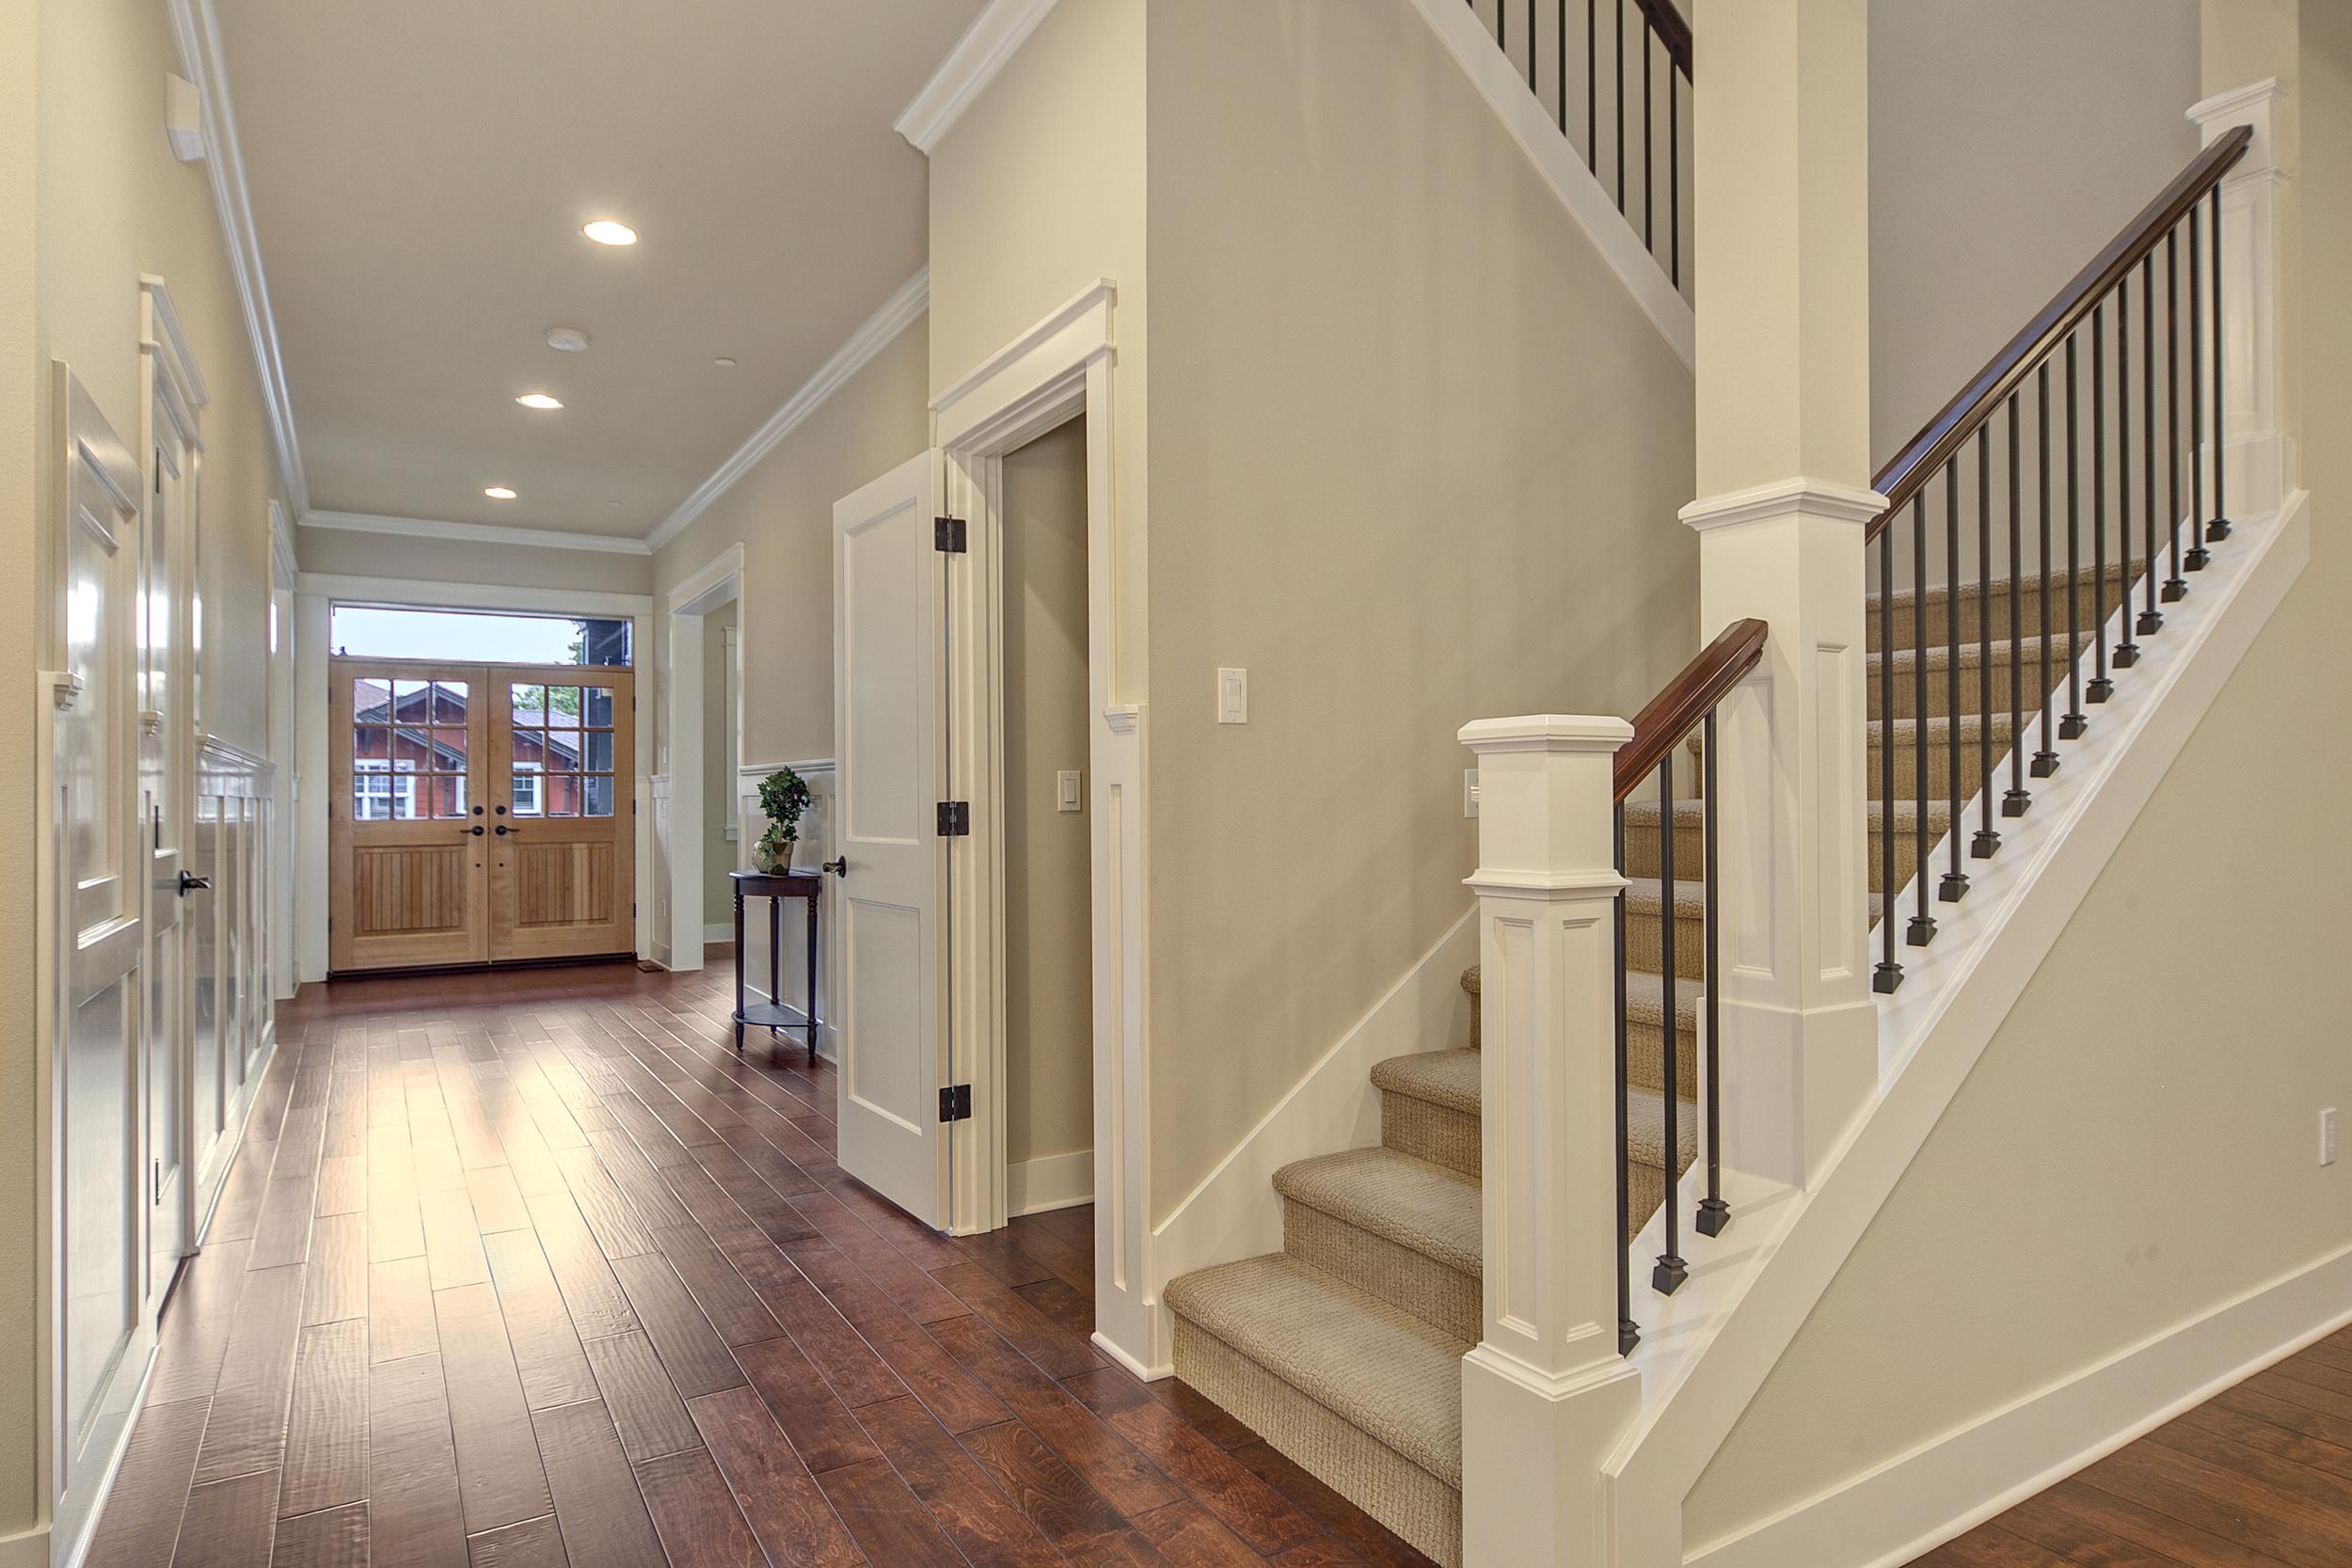 12_hallway.jpg